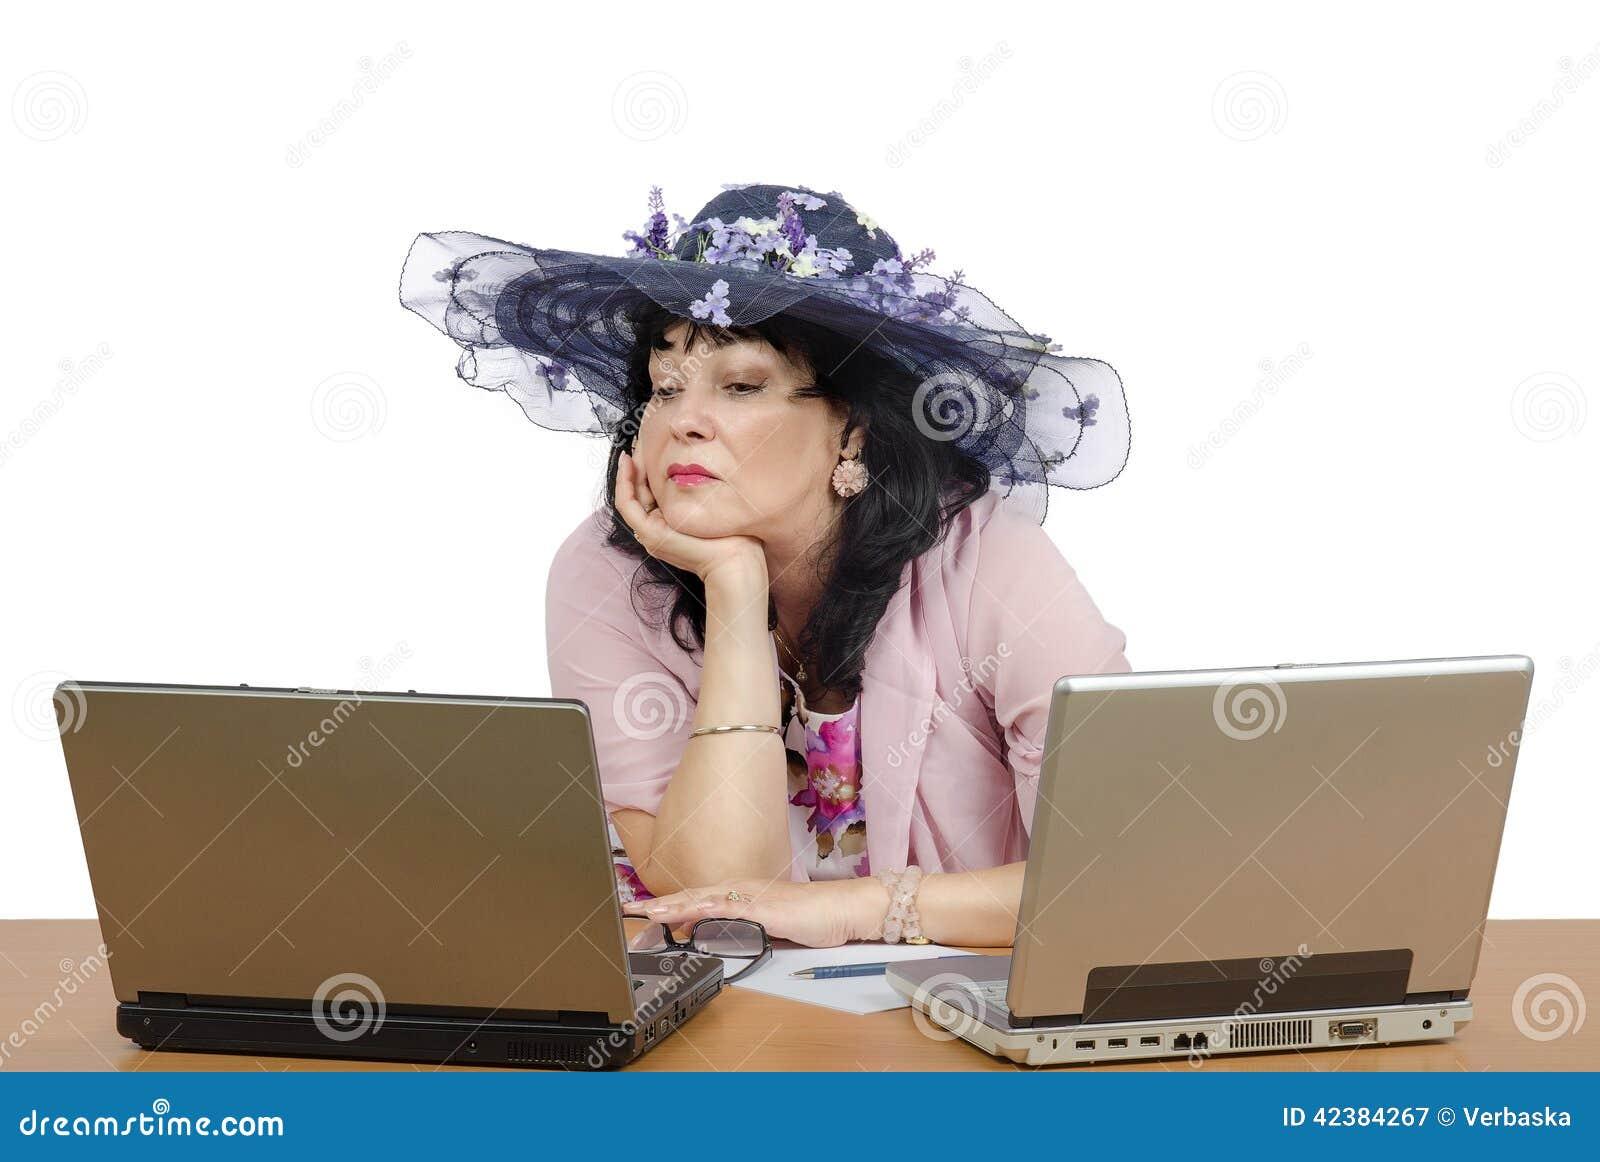 dating profiles database